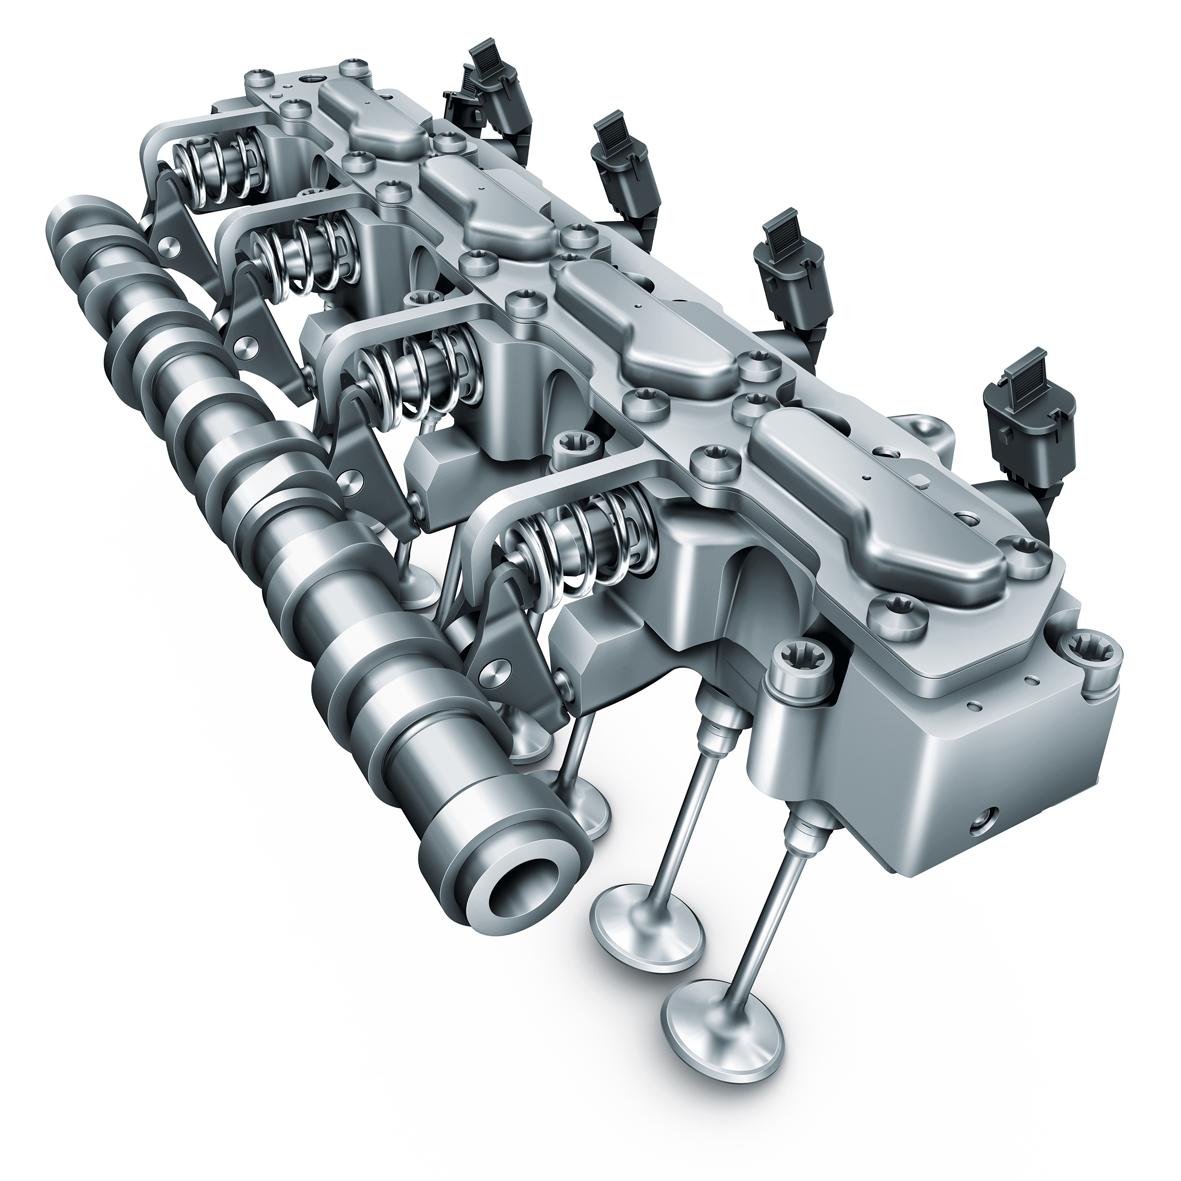 Fully variable UniAir valve control system